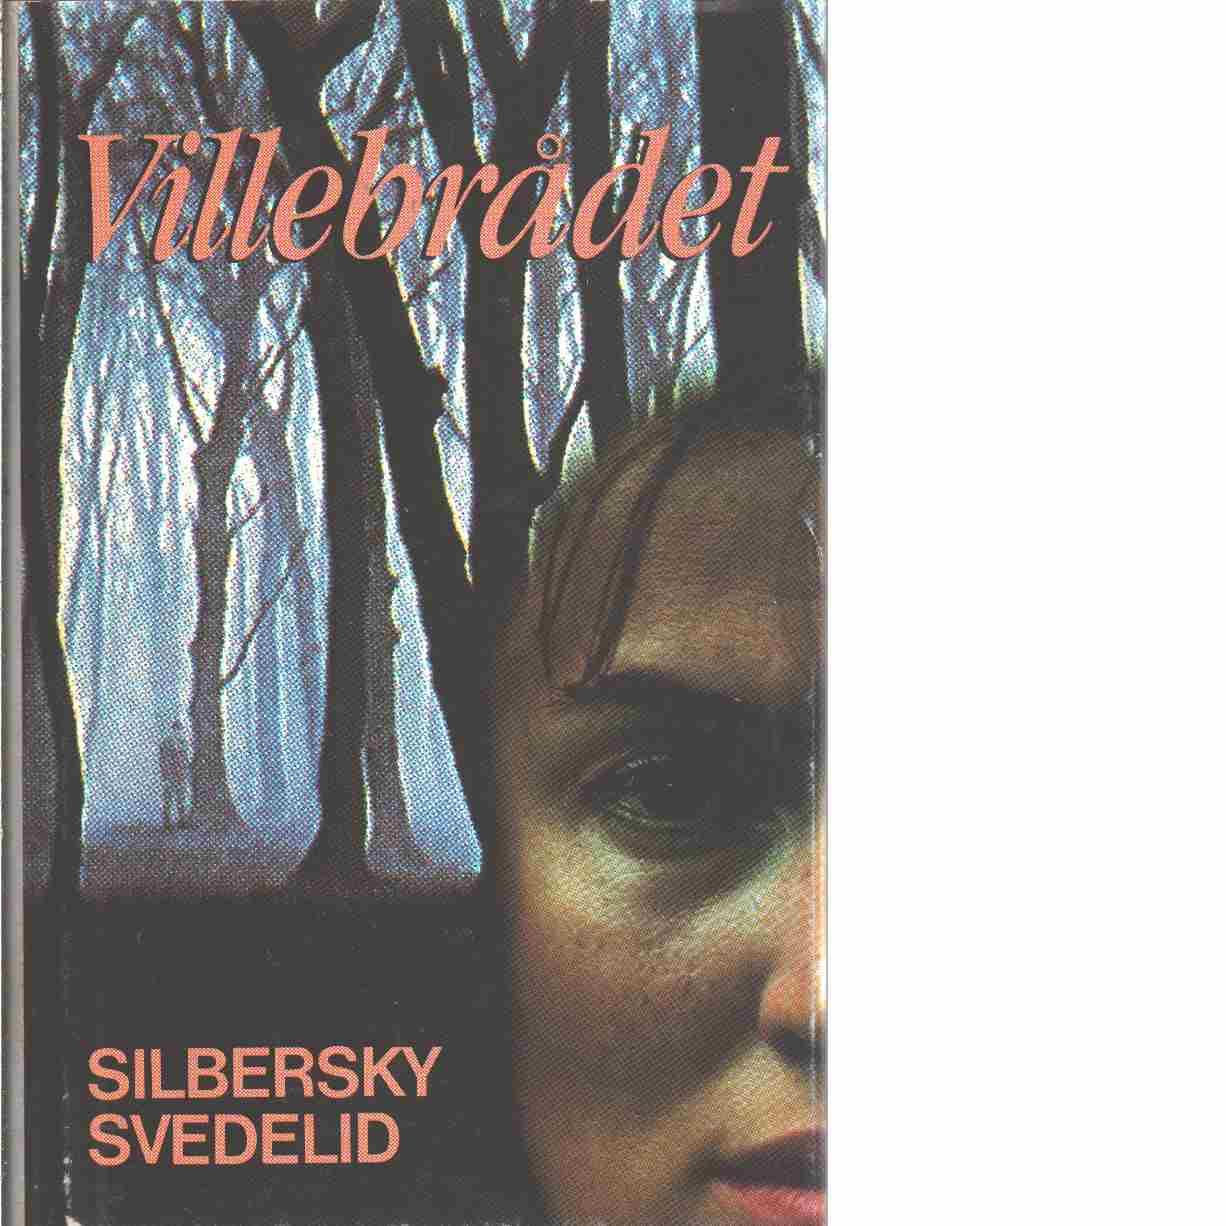 Villebrådet - Silbersky, Leif och Svedelid, Olov